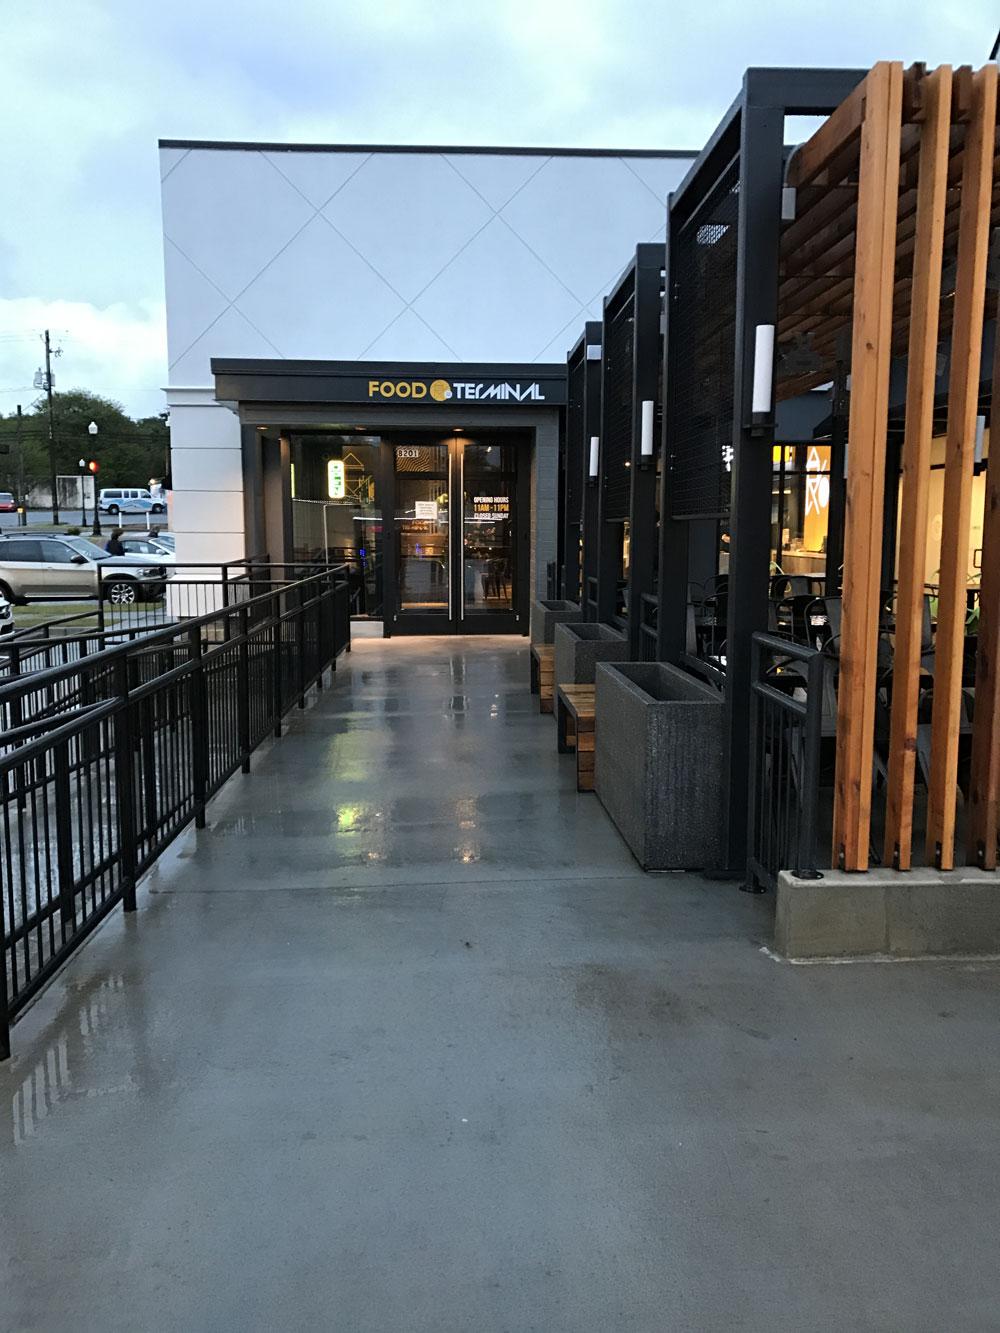 Independent Restaurant Review Food Terminal Chamblee Atlanta Georgia